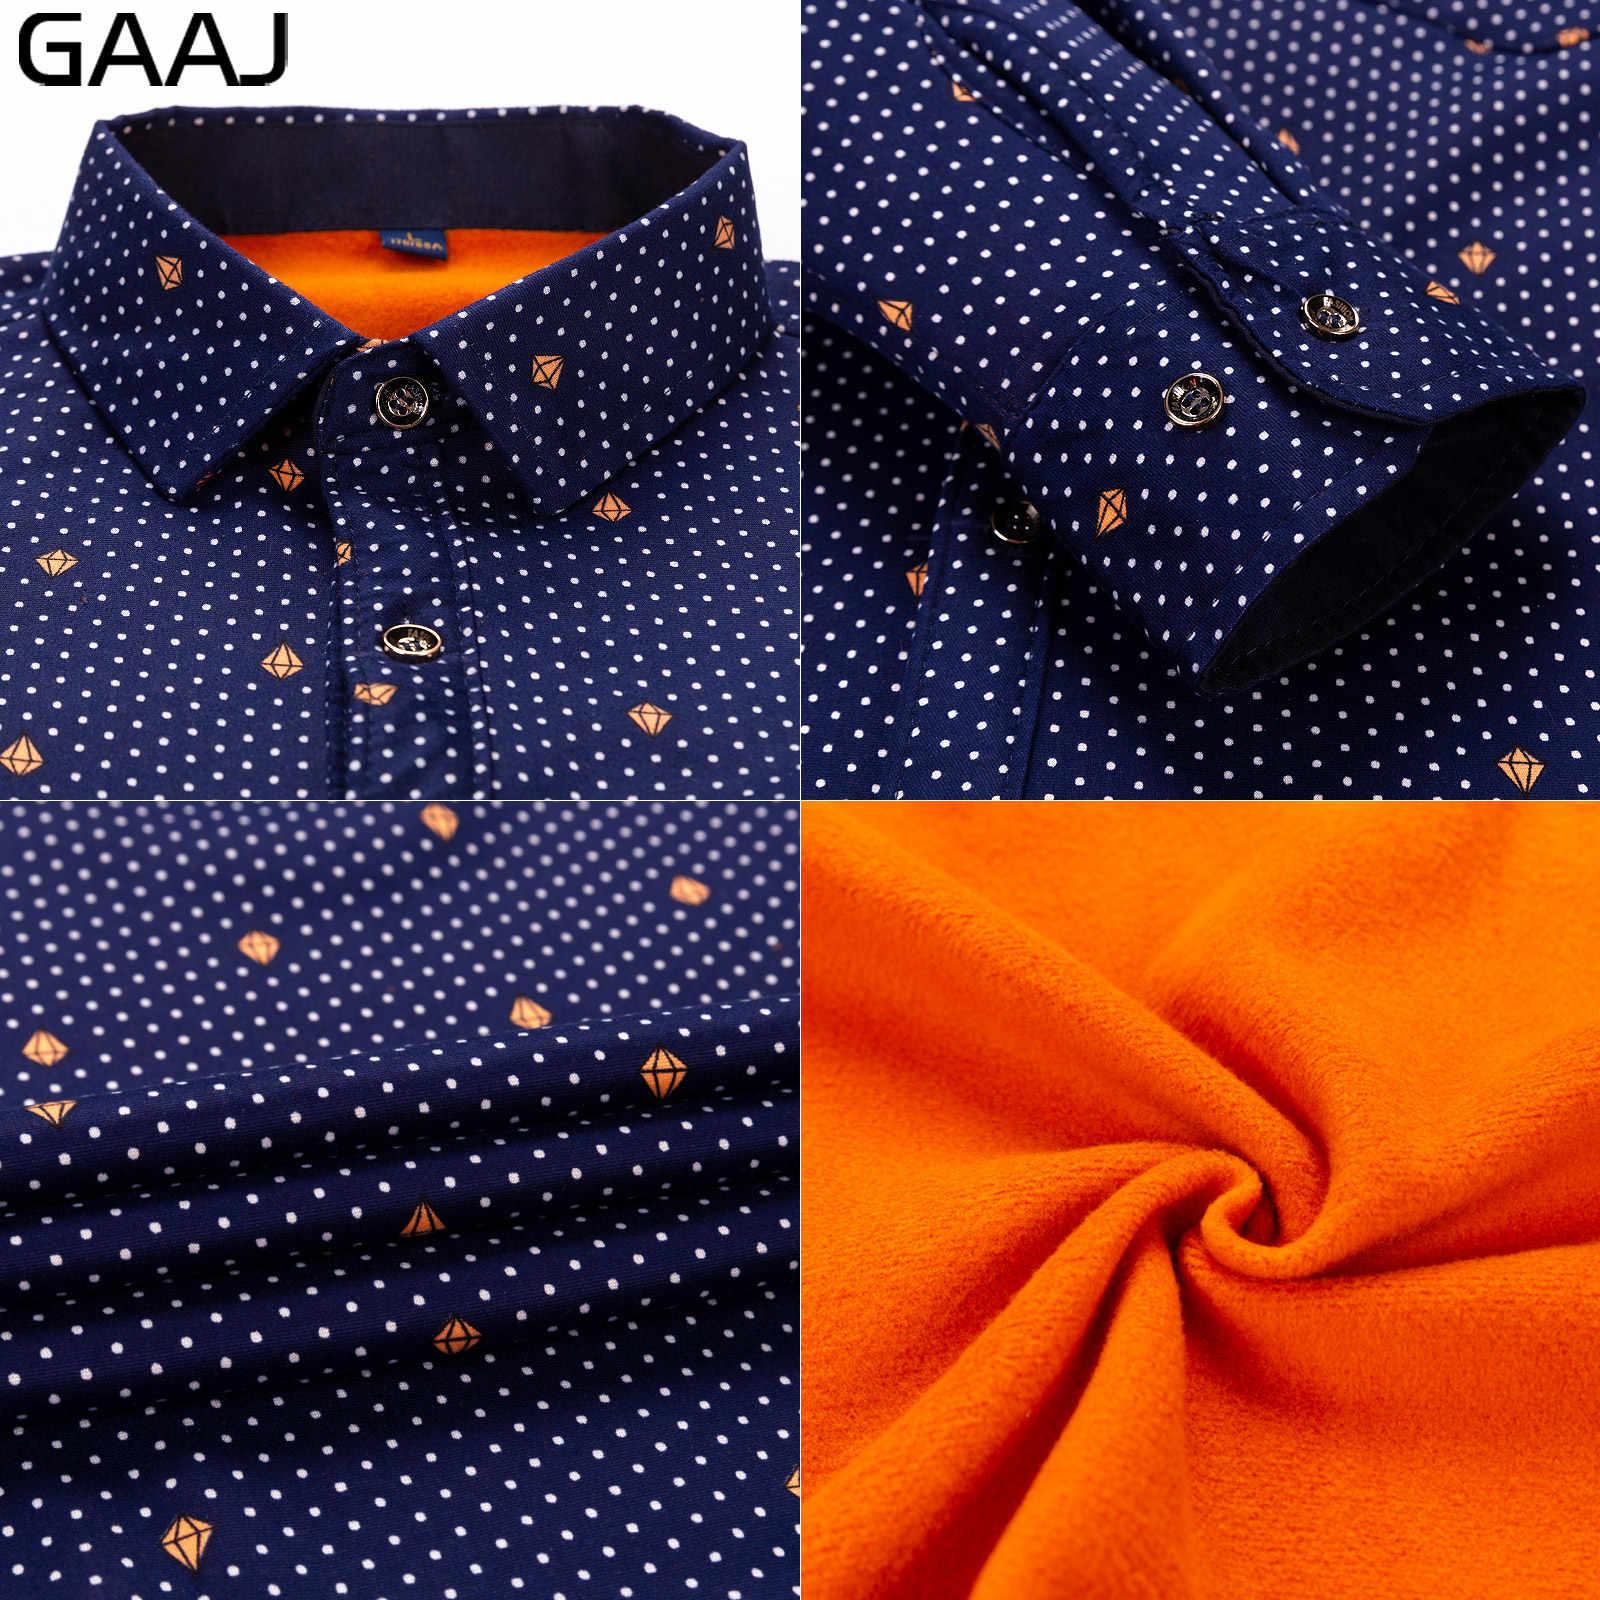 GAAJ 男性シャツ長袖花の正式なファッションプリントチェック柄市松カジュアルシャツコットンソーシャルシャツメンズシャツ暖かいのための毛皮とメンズ